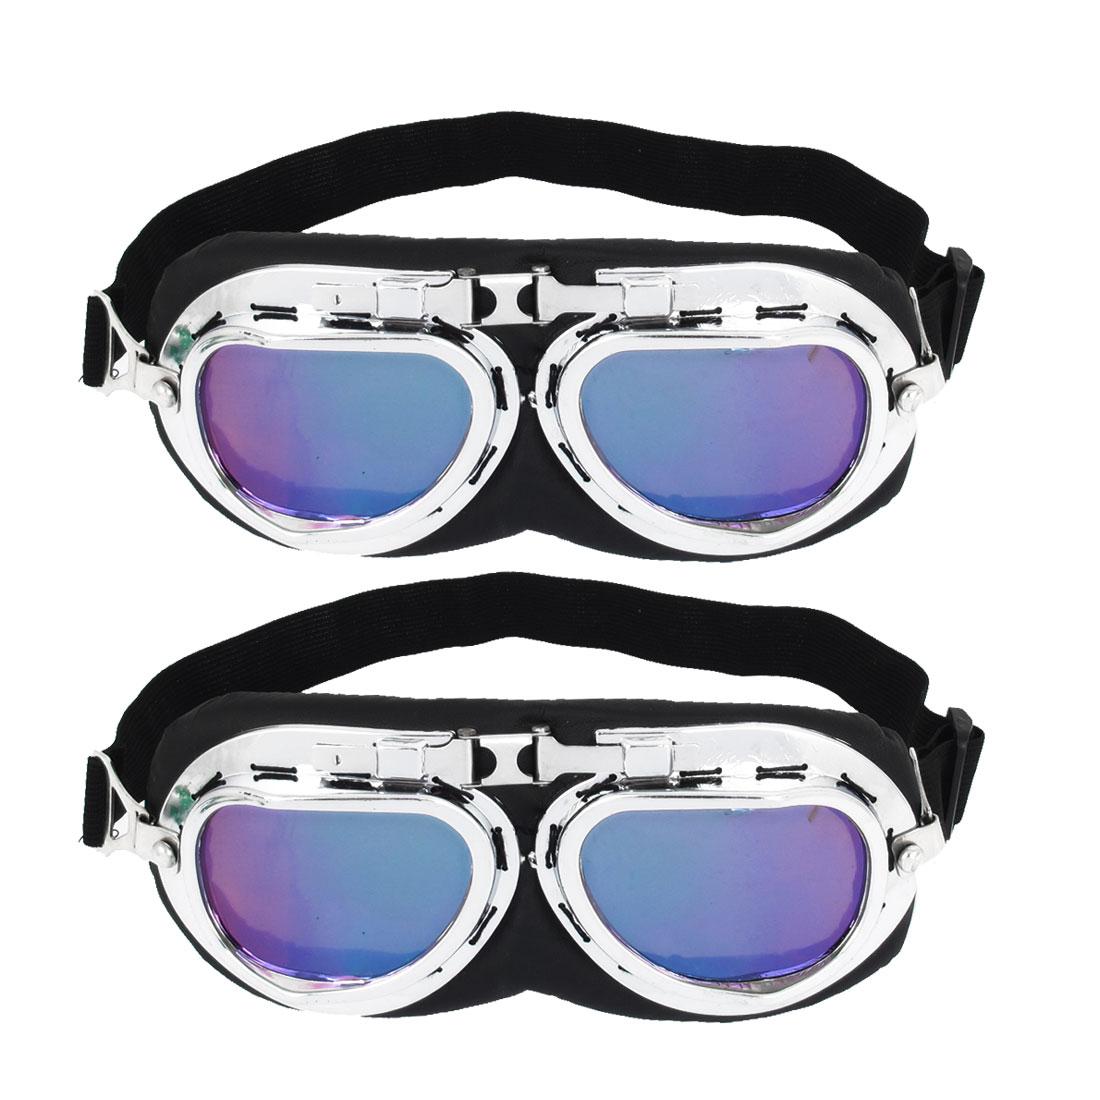 2 Pcs Adjustable Elastic Strap Purple Lens Full Frame Motorbike Goggles Sunglasses